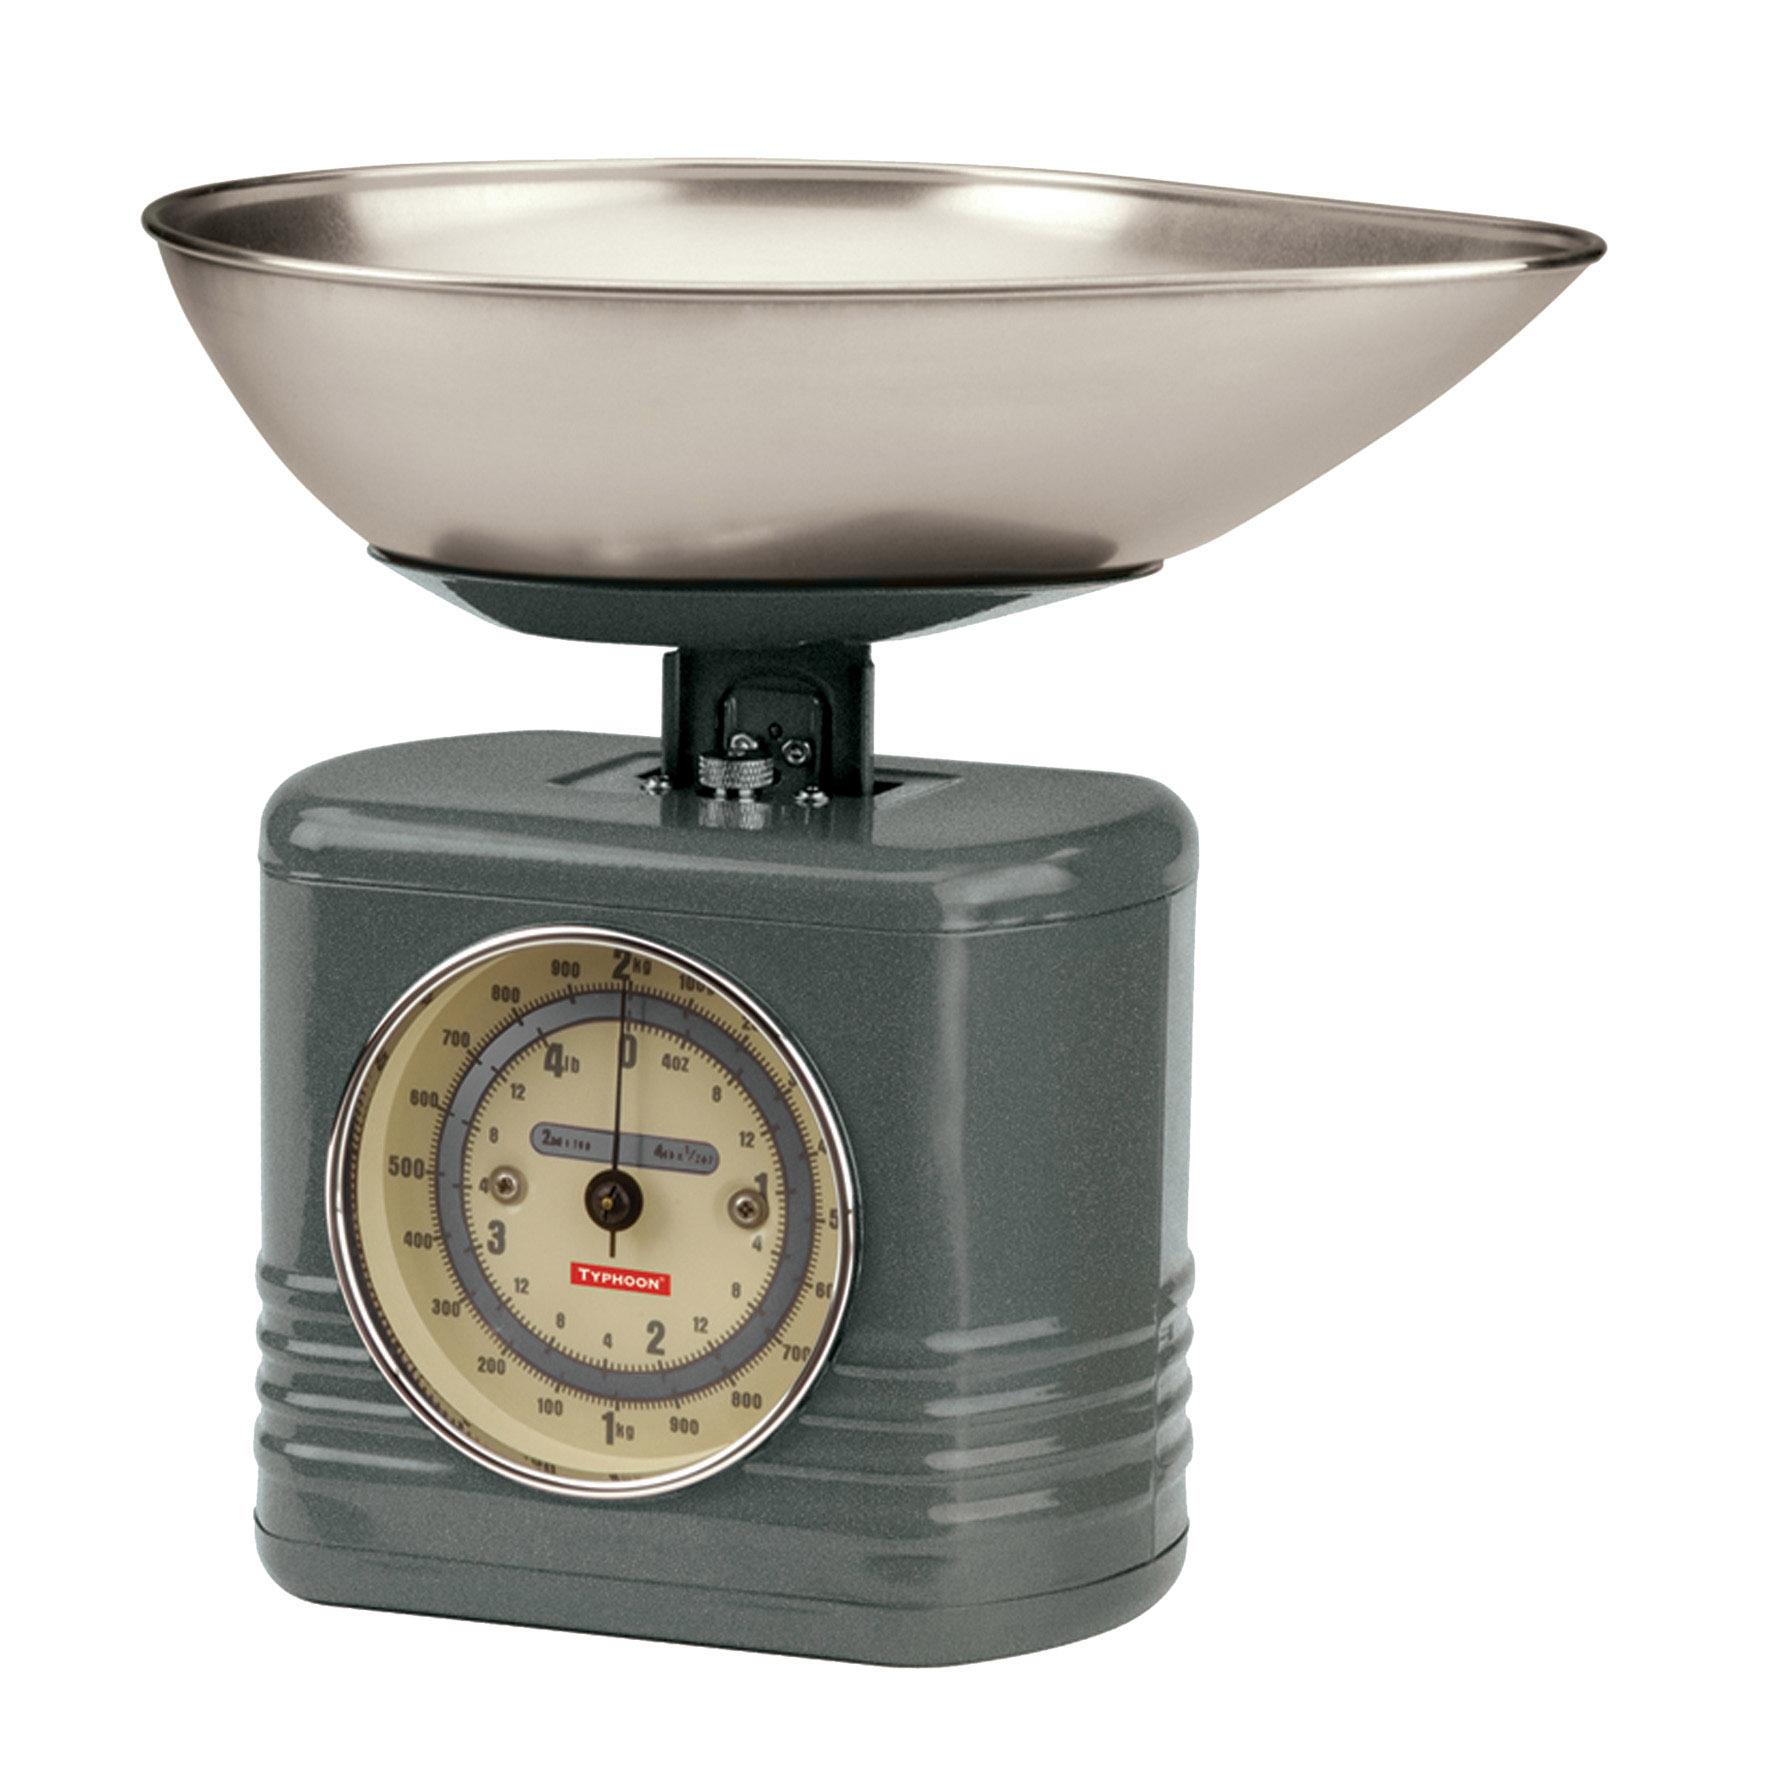 Antique Kitchen Scale: Typhoon Traditional Vintage Kitchen Scales 2kg In Cream